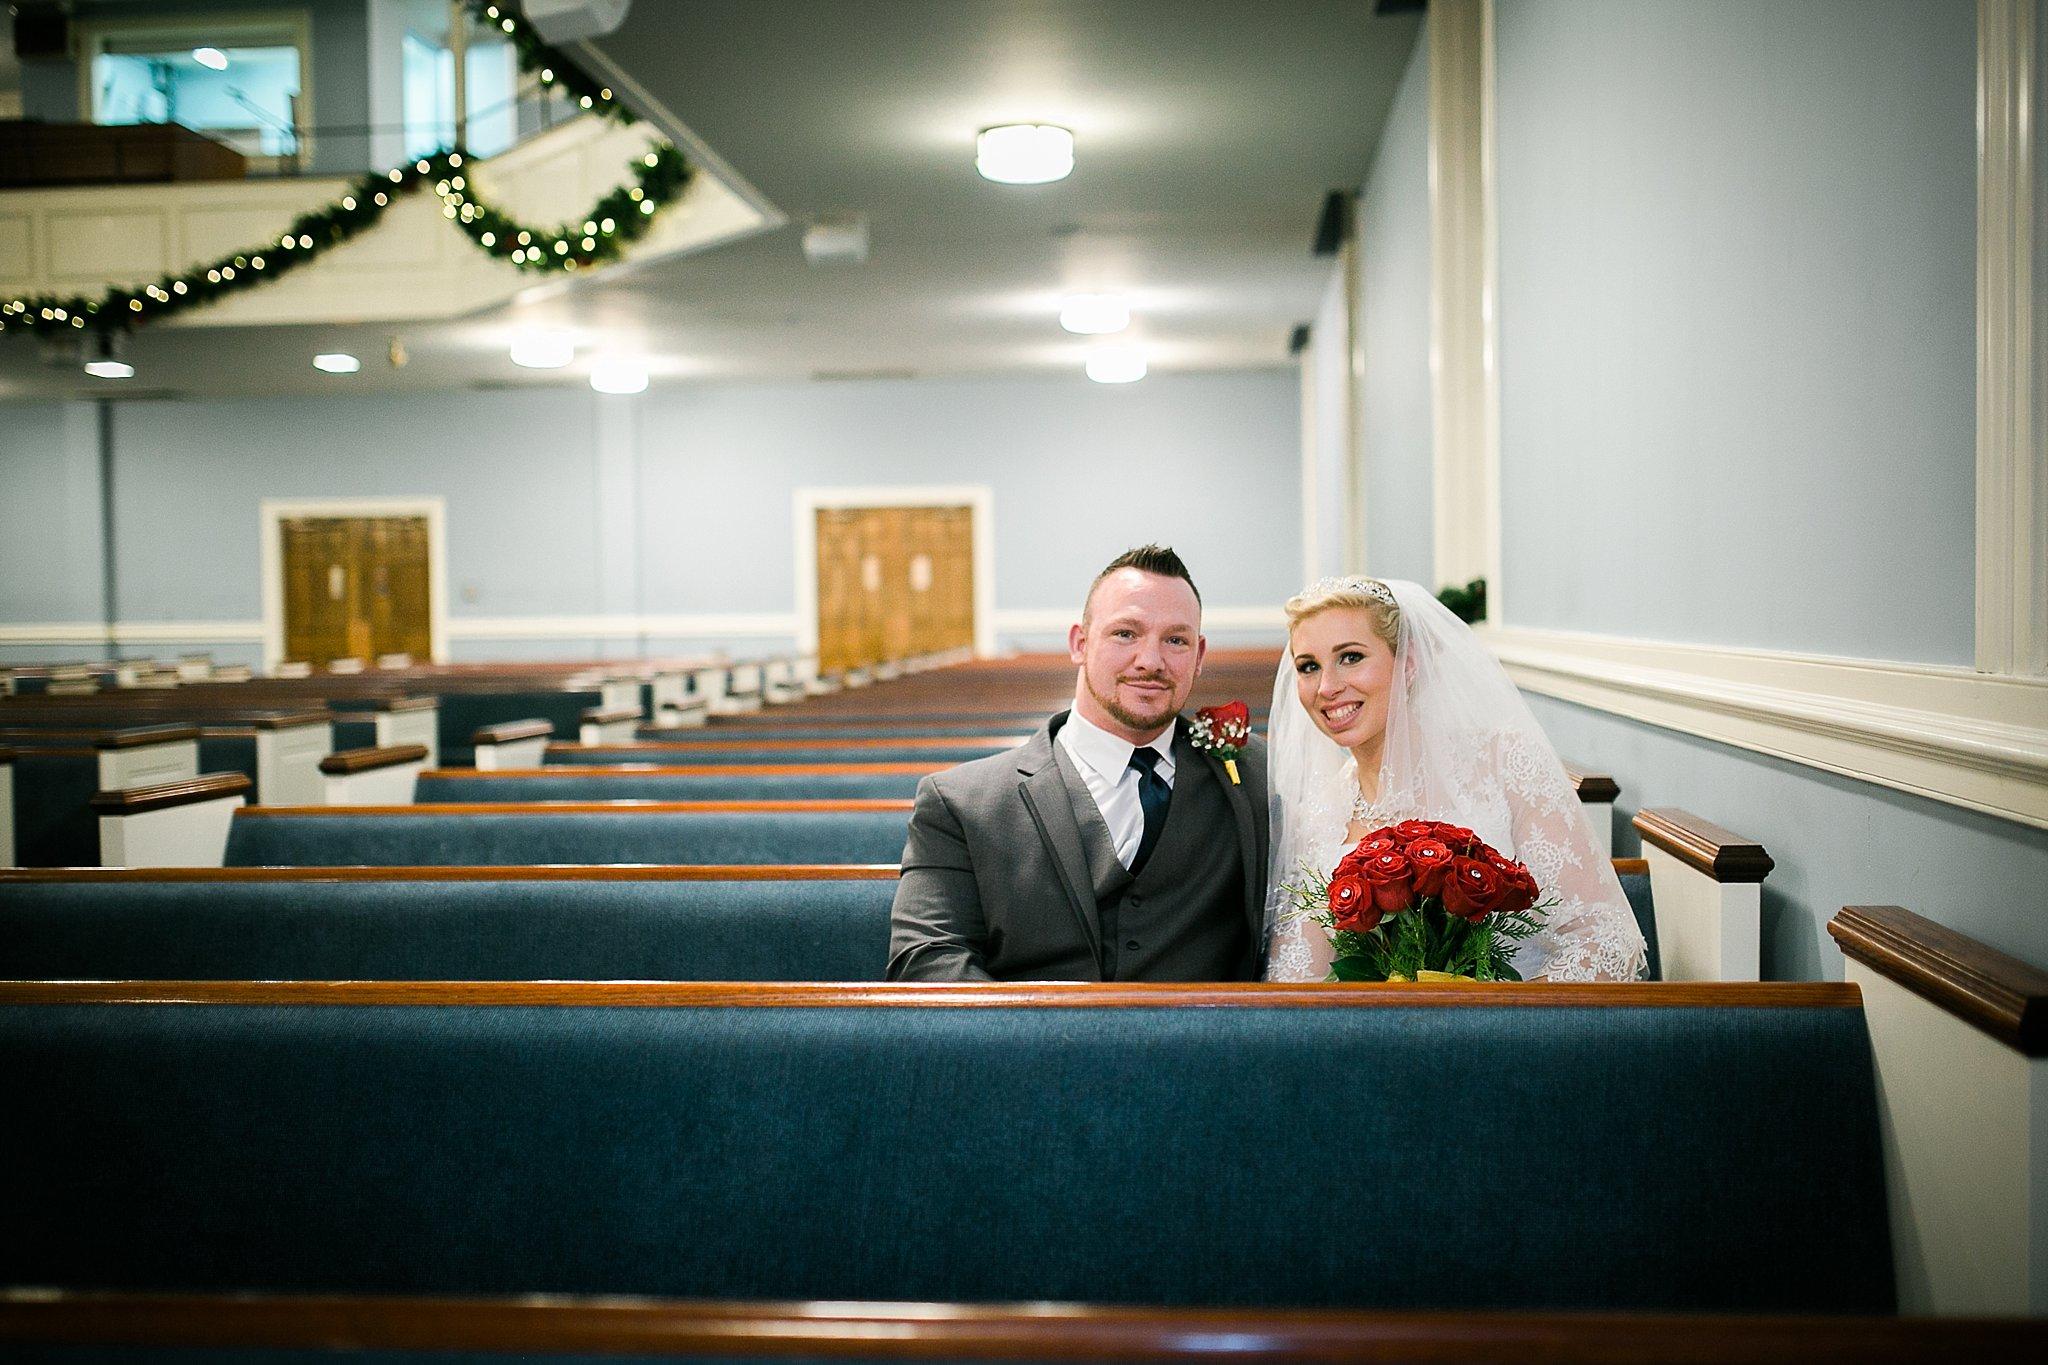 Wollaston Church of the Nazarene Wedding Boston Wedding Photographer33.jpg